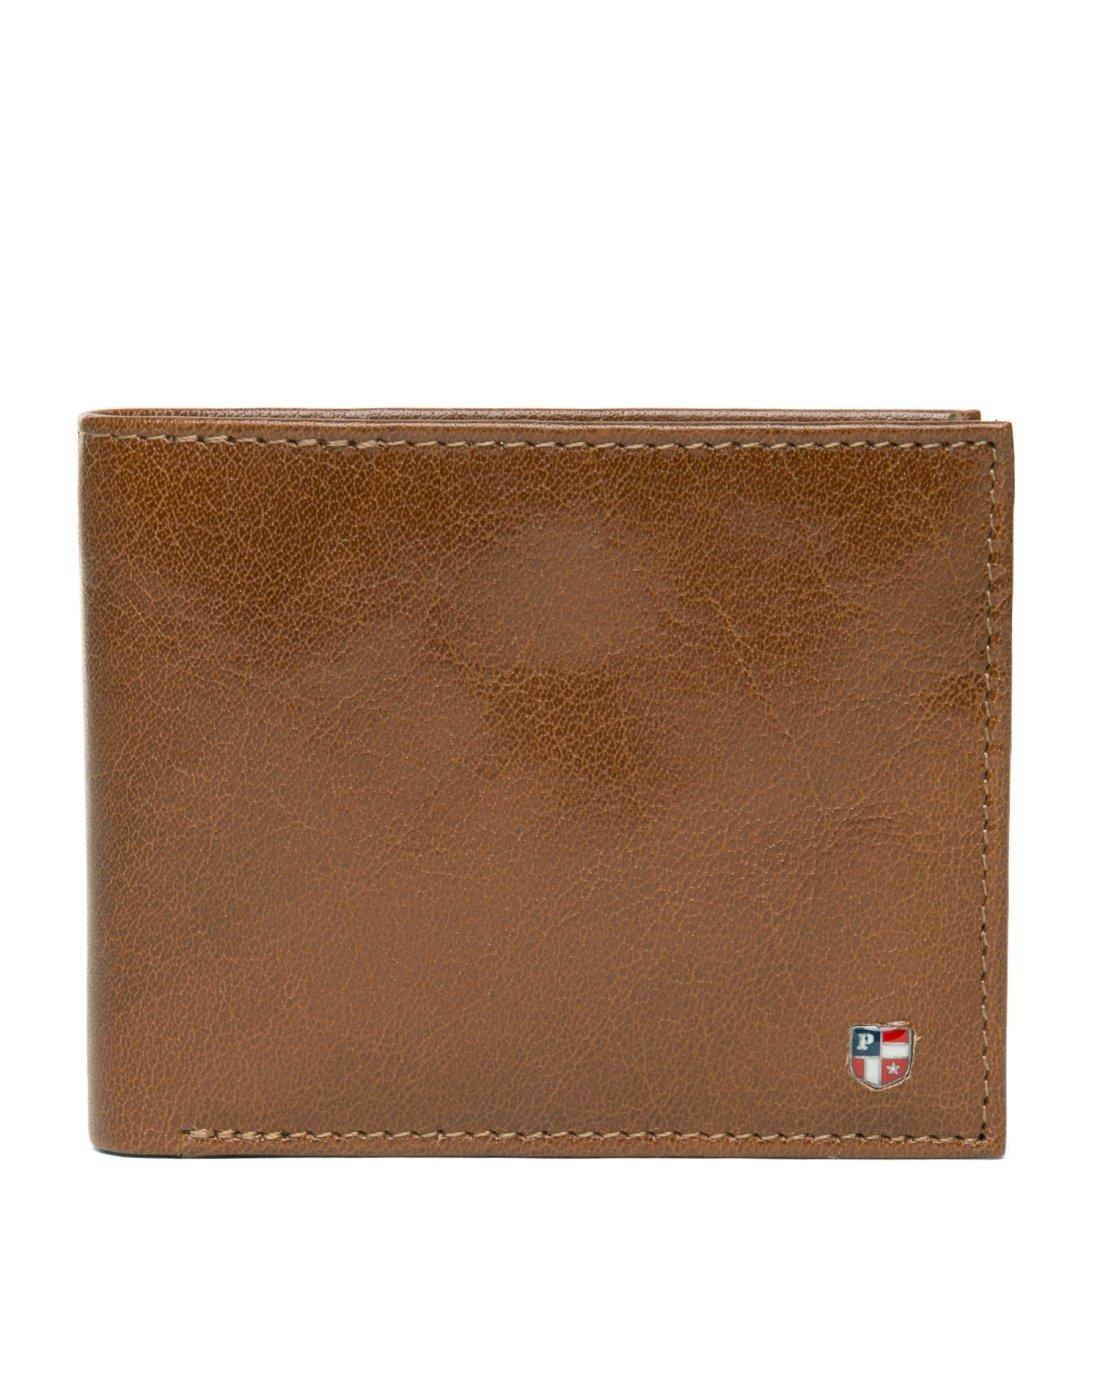 U.S. Polo Assn. Men Wallet – Buy Bestow e5111b9991b84